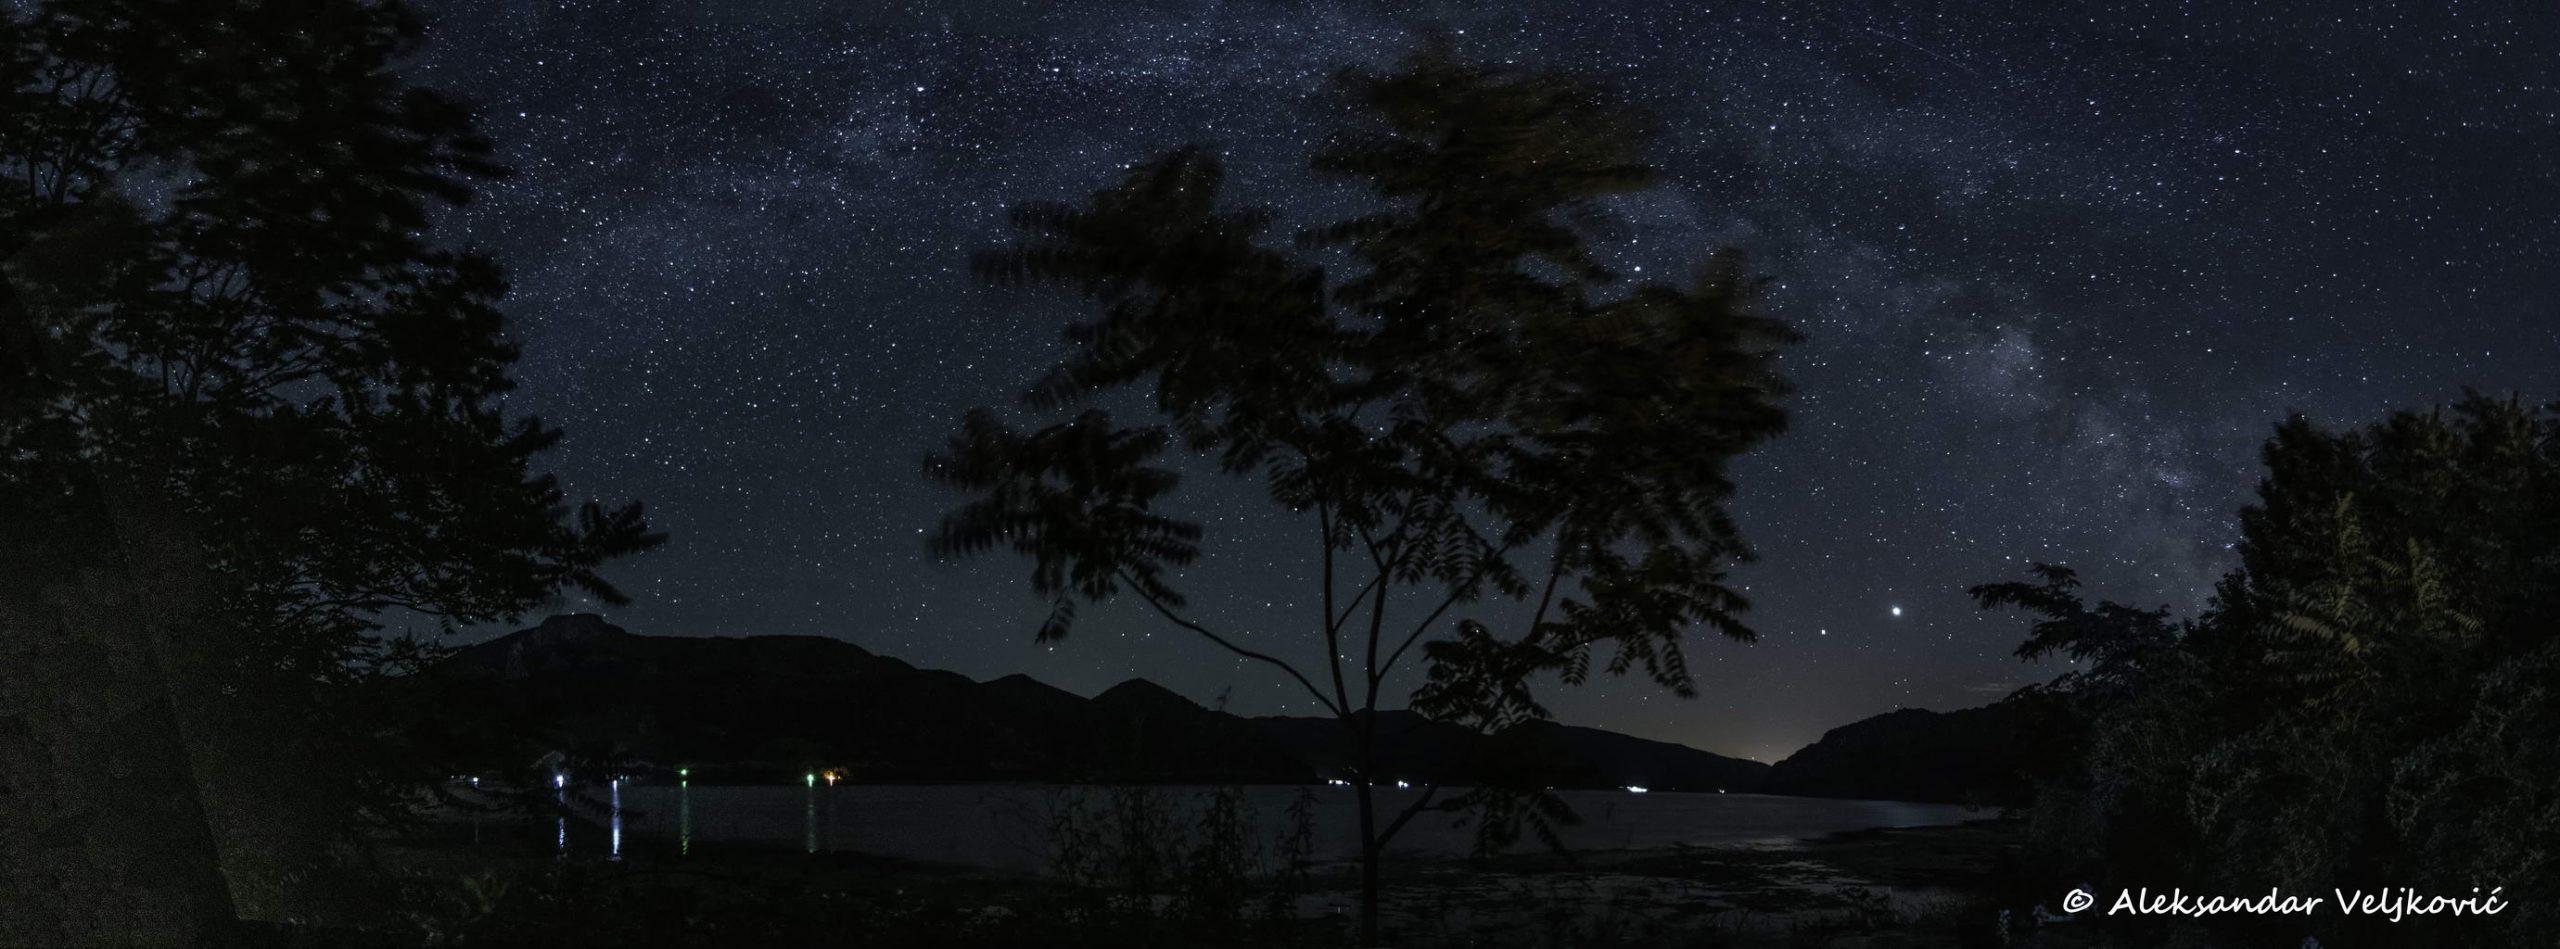 The magic of the night on Danube riverbank